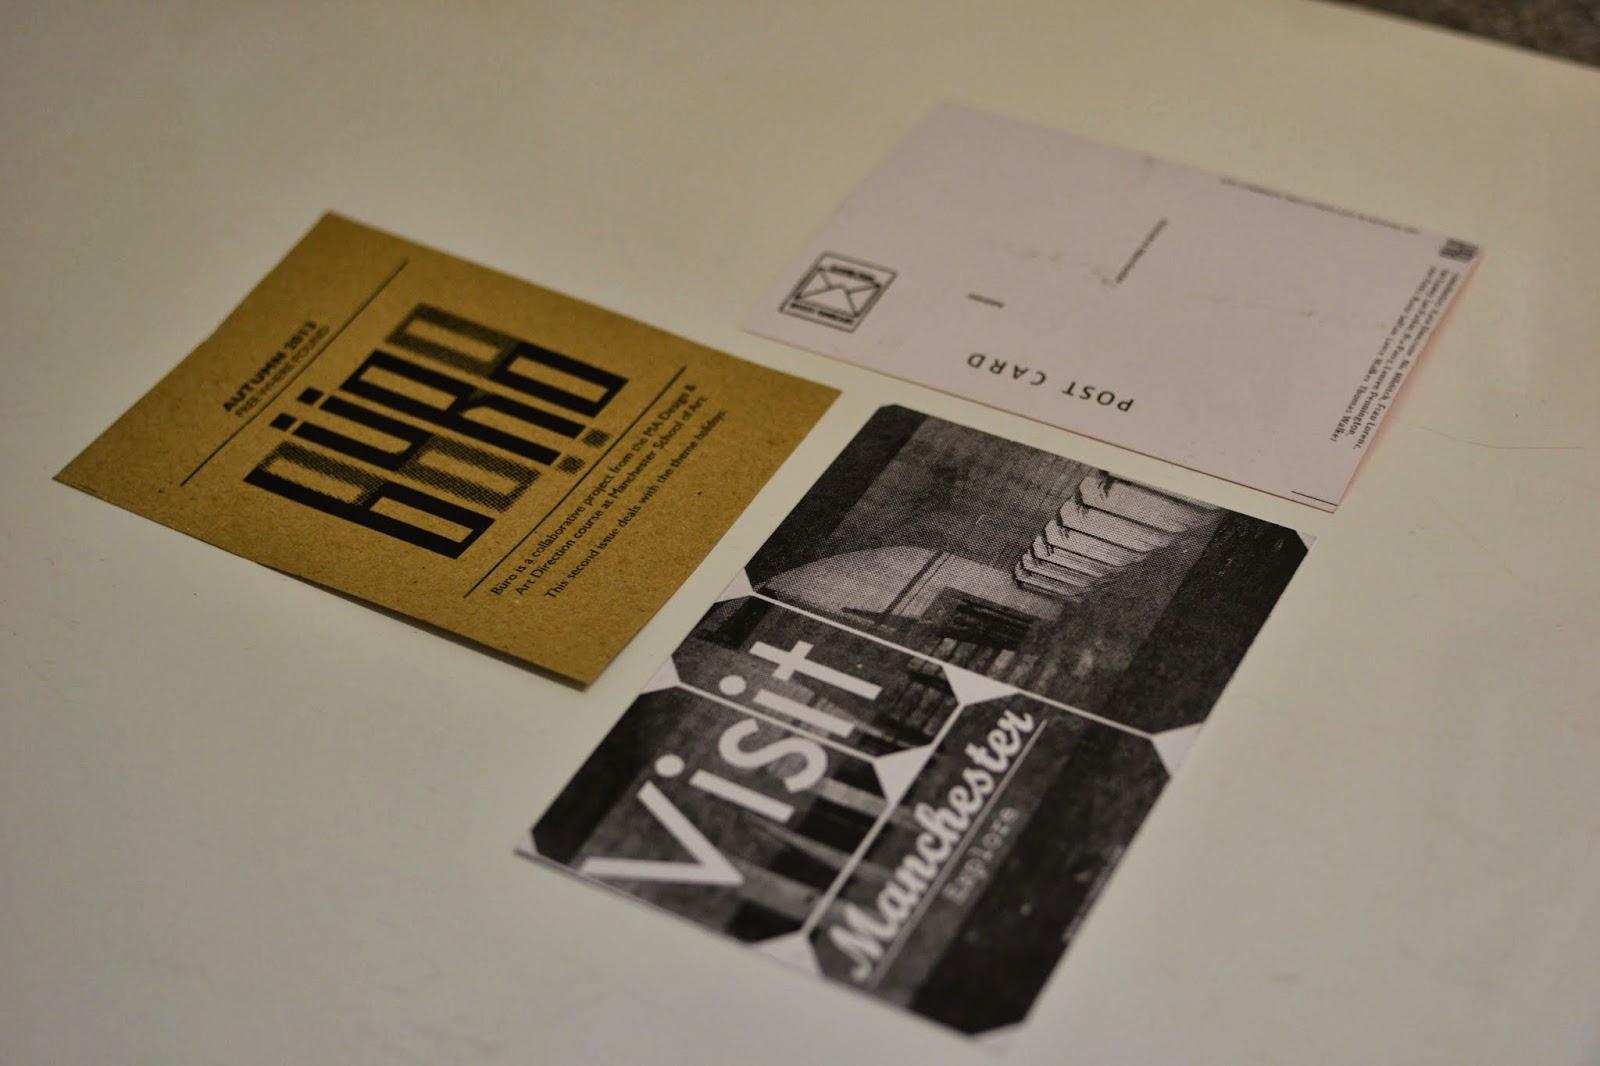 screenprint, postcard, manchester, buro, buro 1.5, mmu, manchester school of art, publication, self printed, self publicised, zine, urbex, victoria arches, holidays, travel, exploration